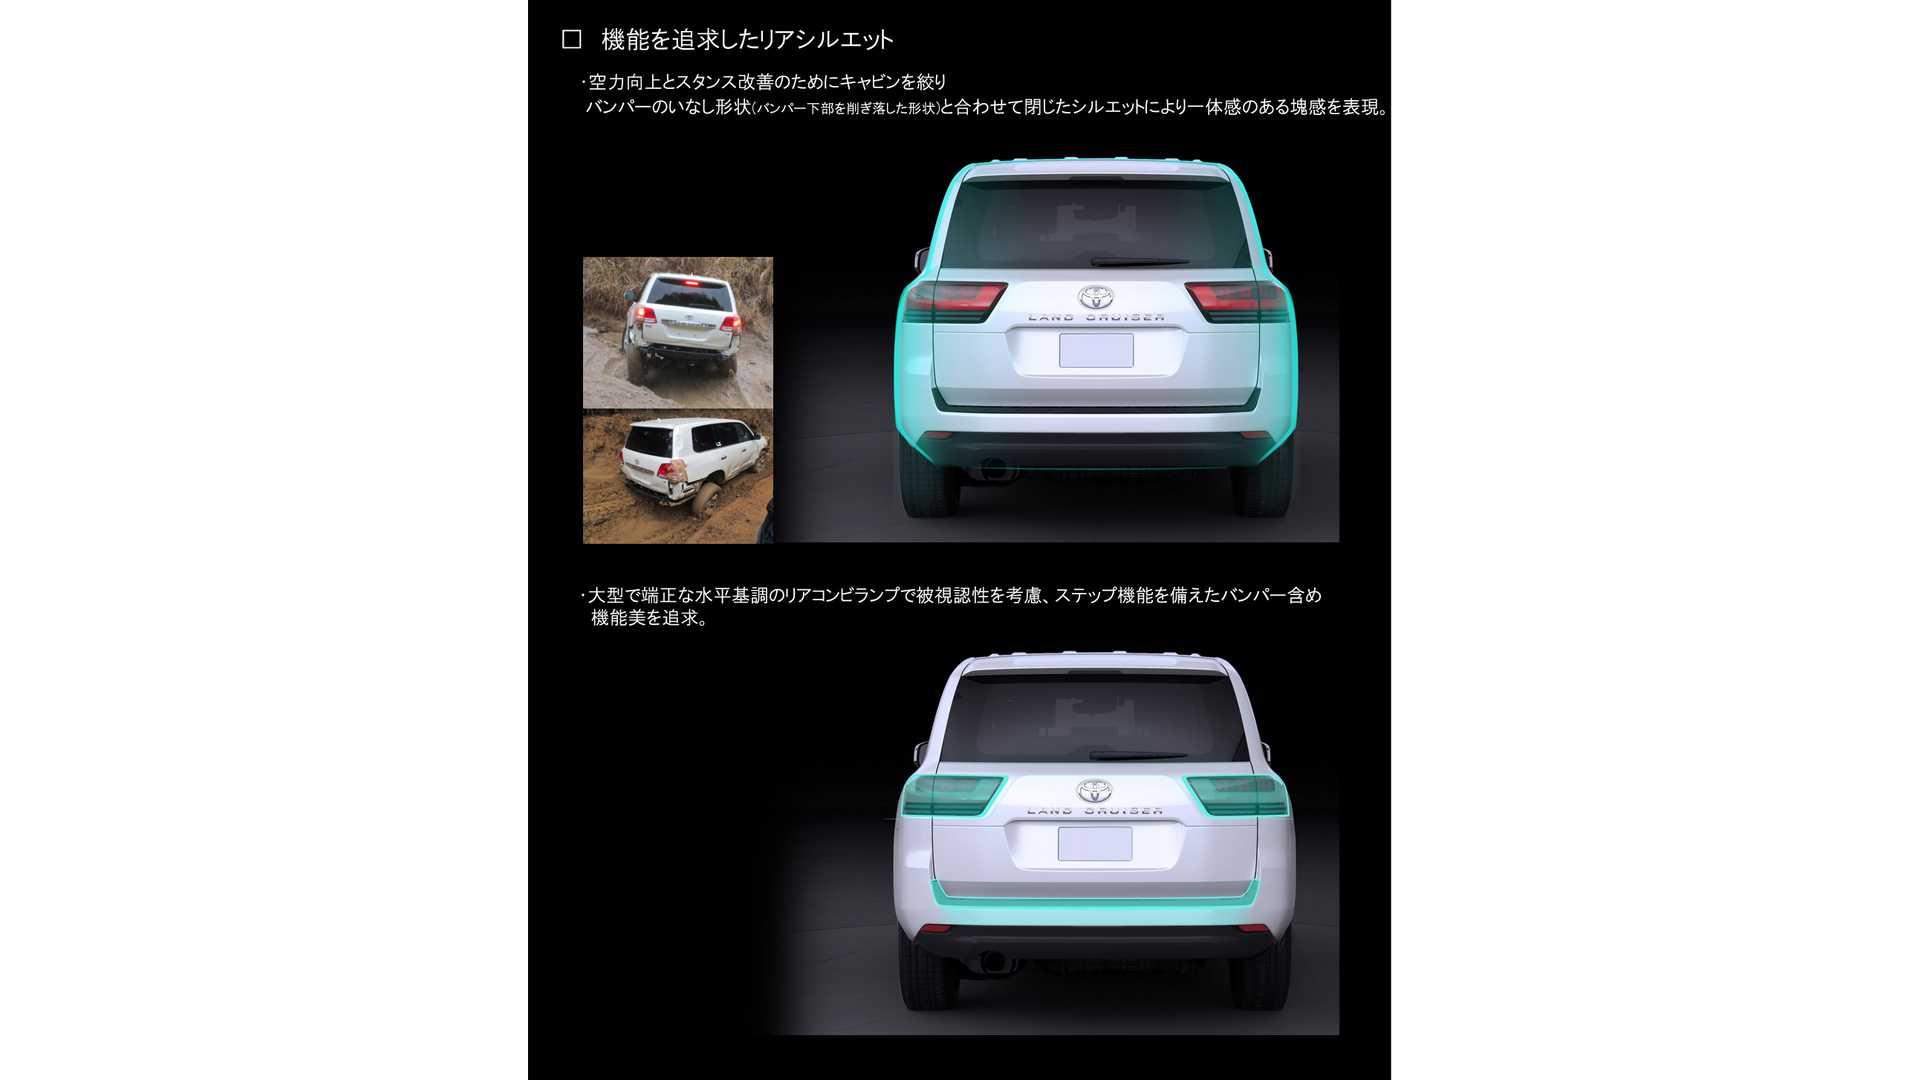 Toyota-Land-Cruiser-design-sketches-17